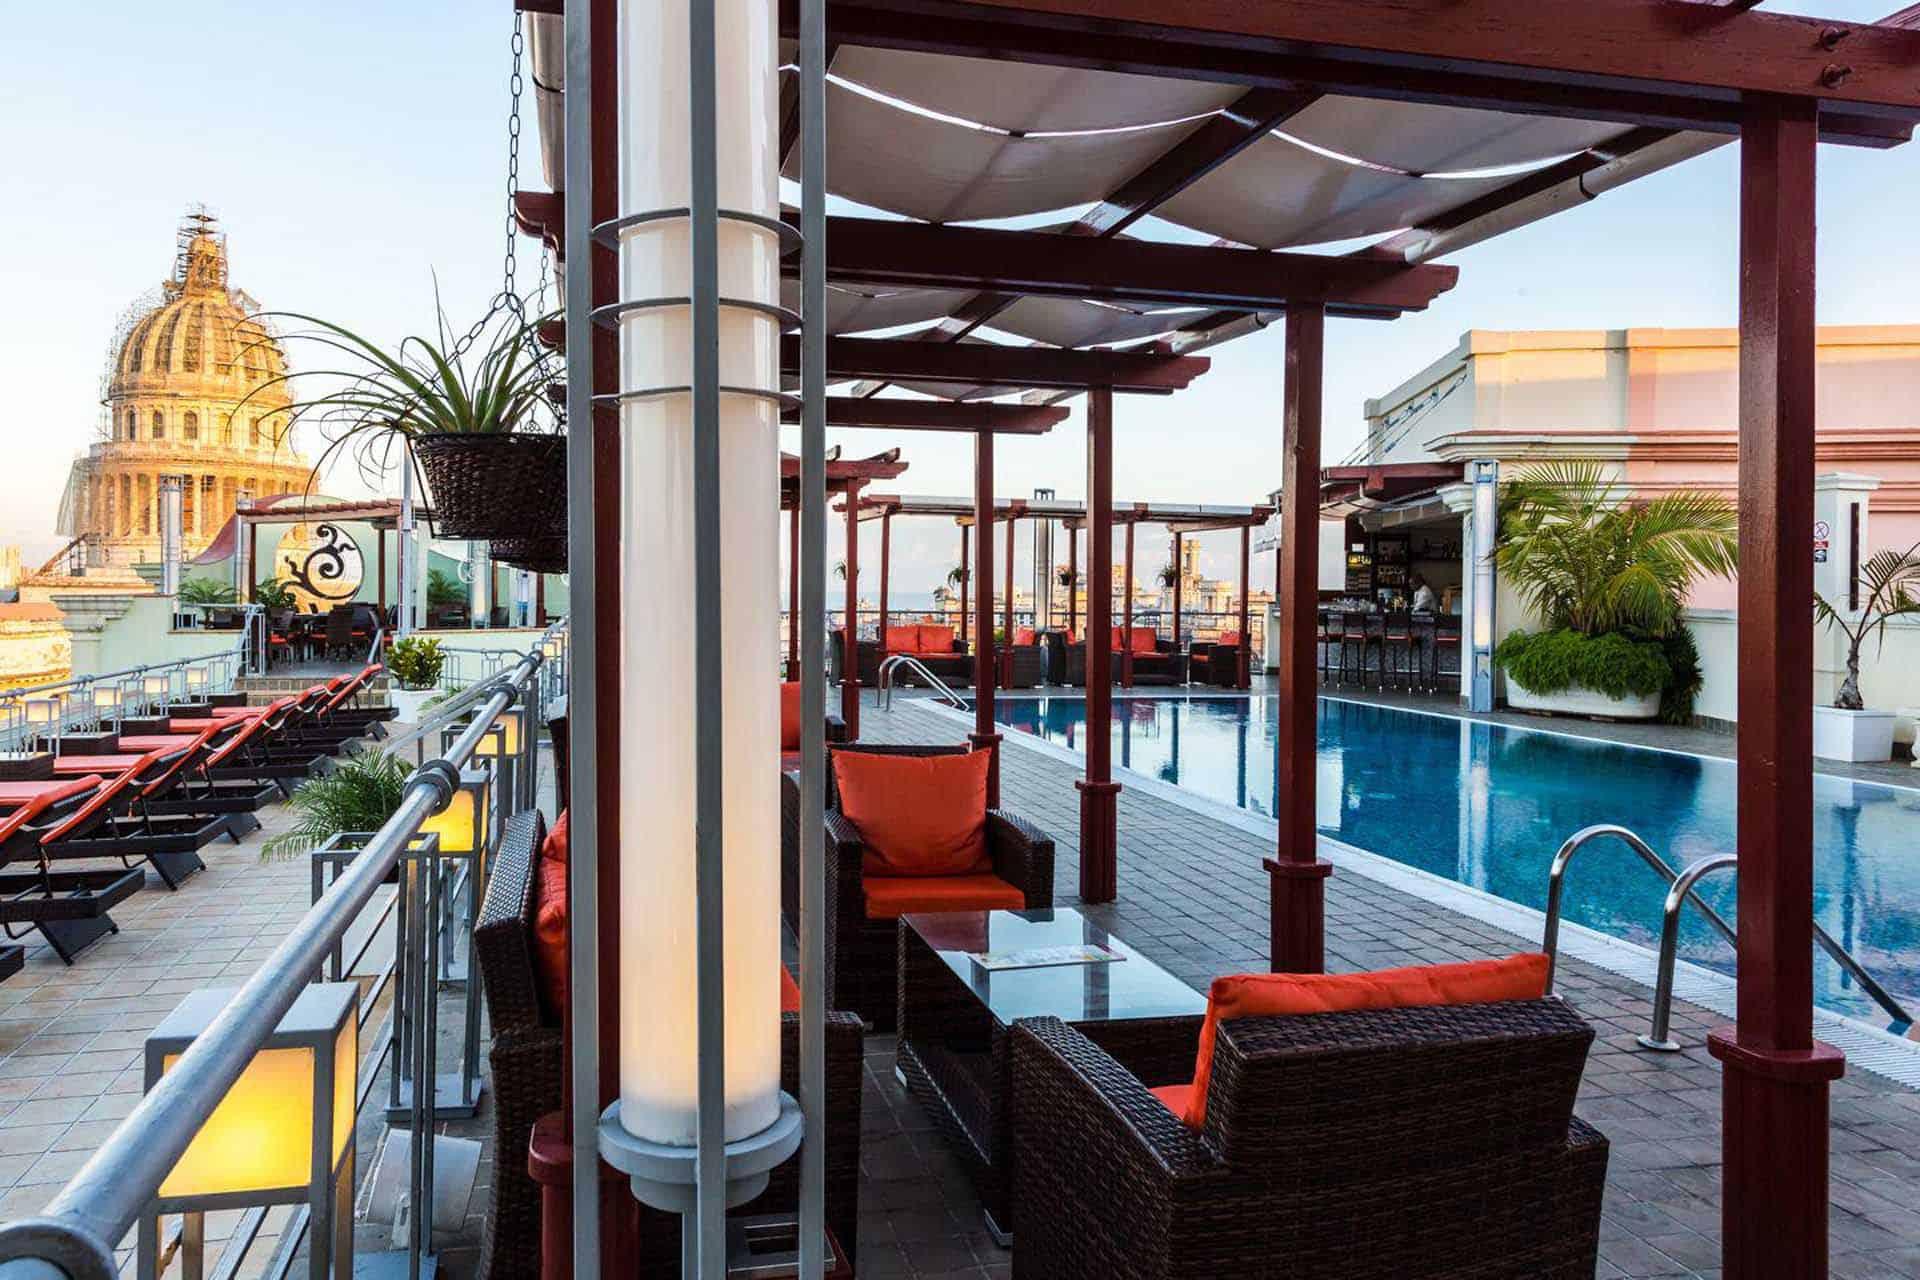 H2483 Hotel Saratoga 02 cuba autrement